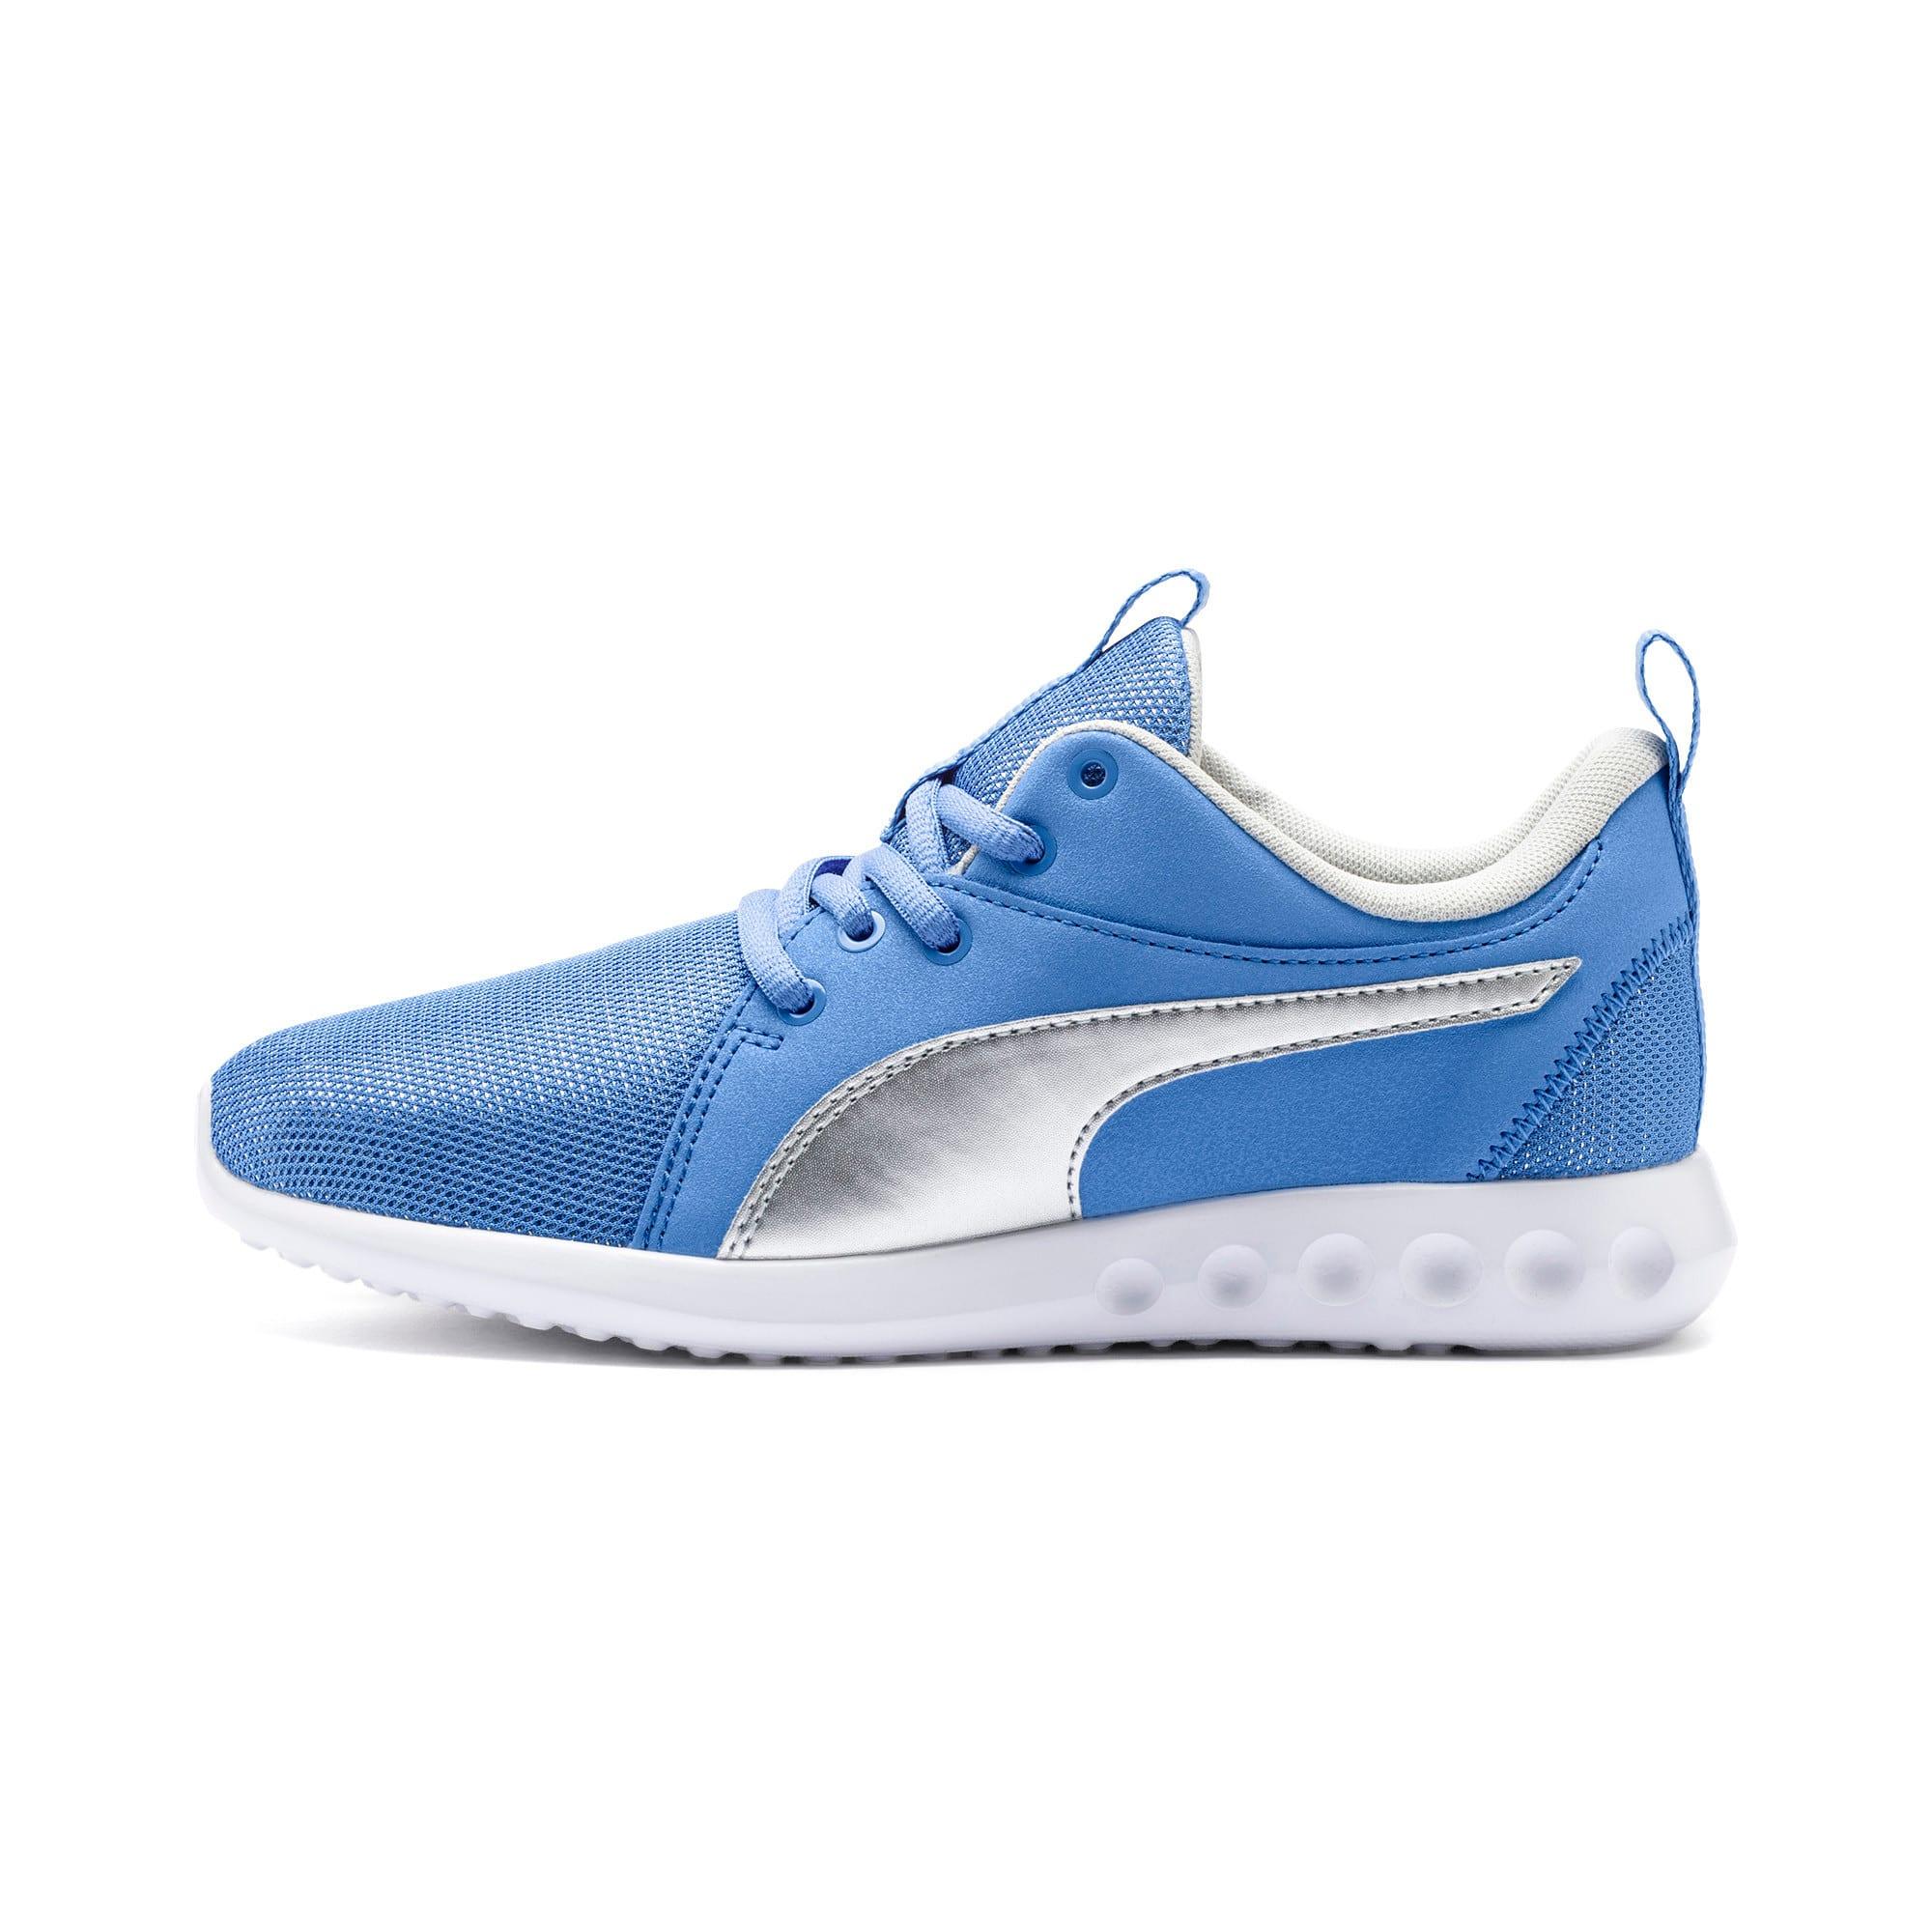 Thumbnail 1 of Carson 2 Glitz Shoes JR, Ultramarine-Silver, medium